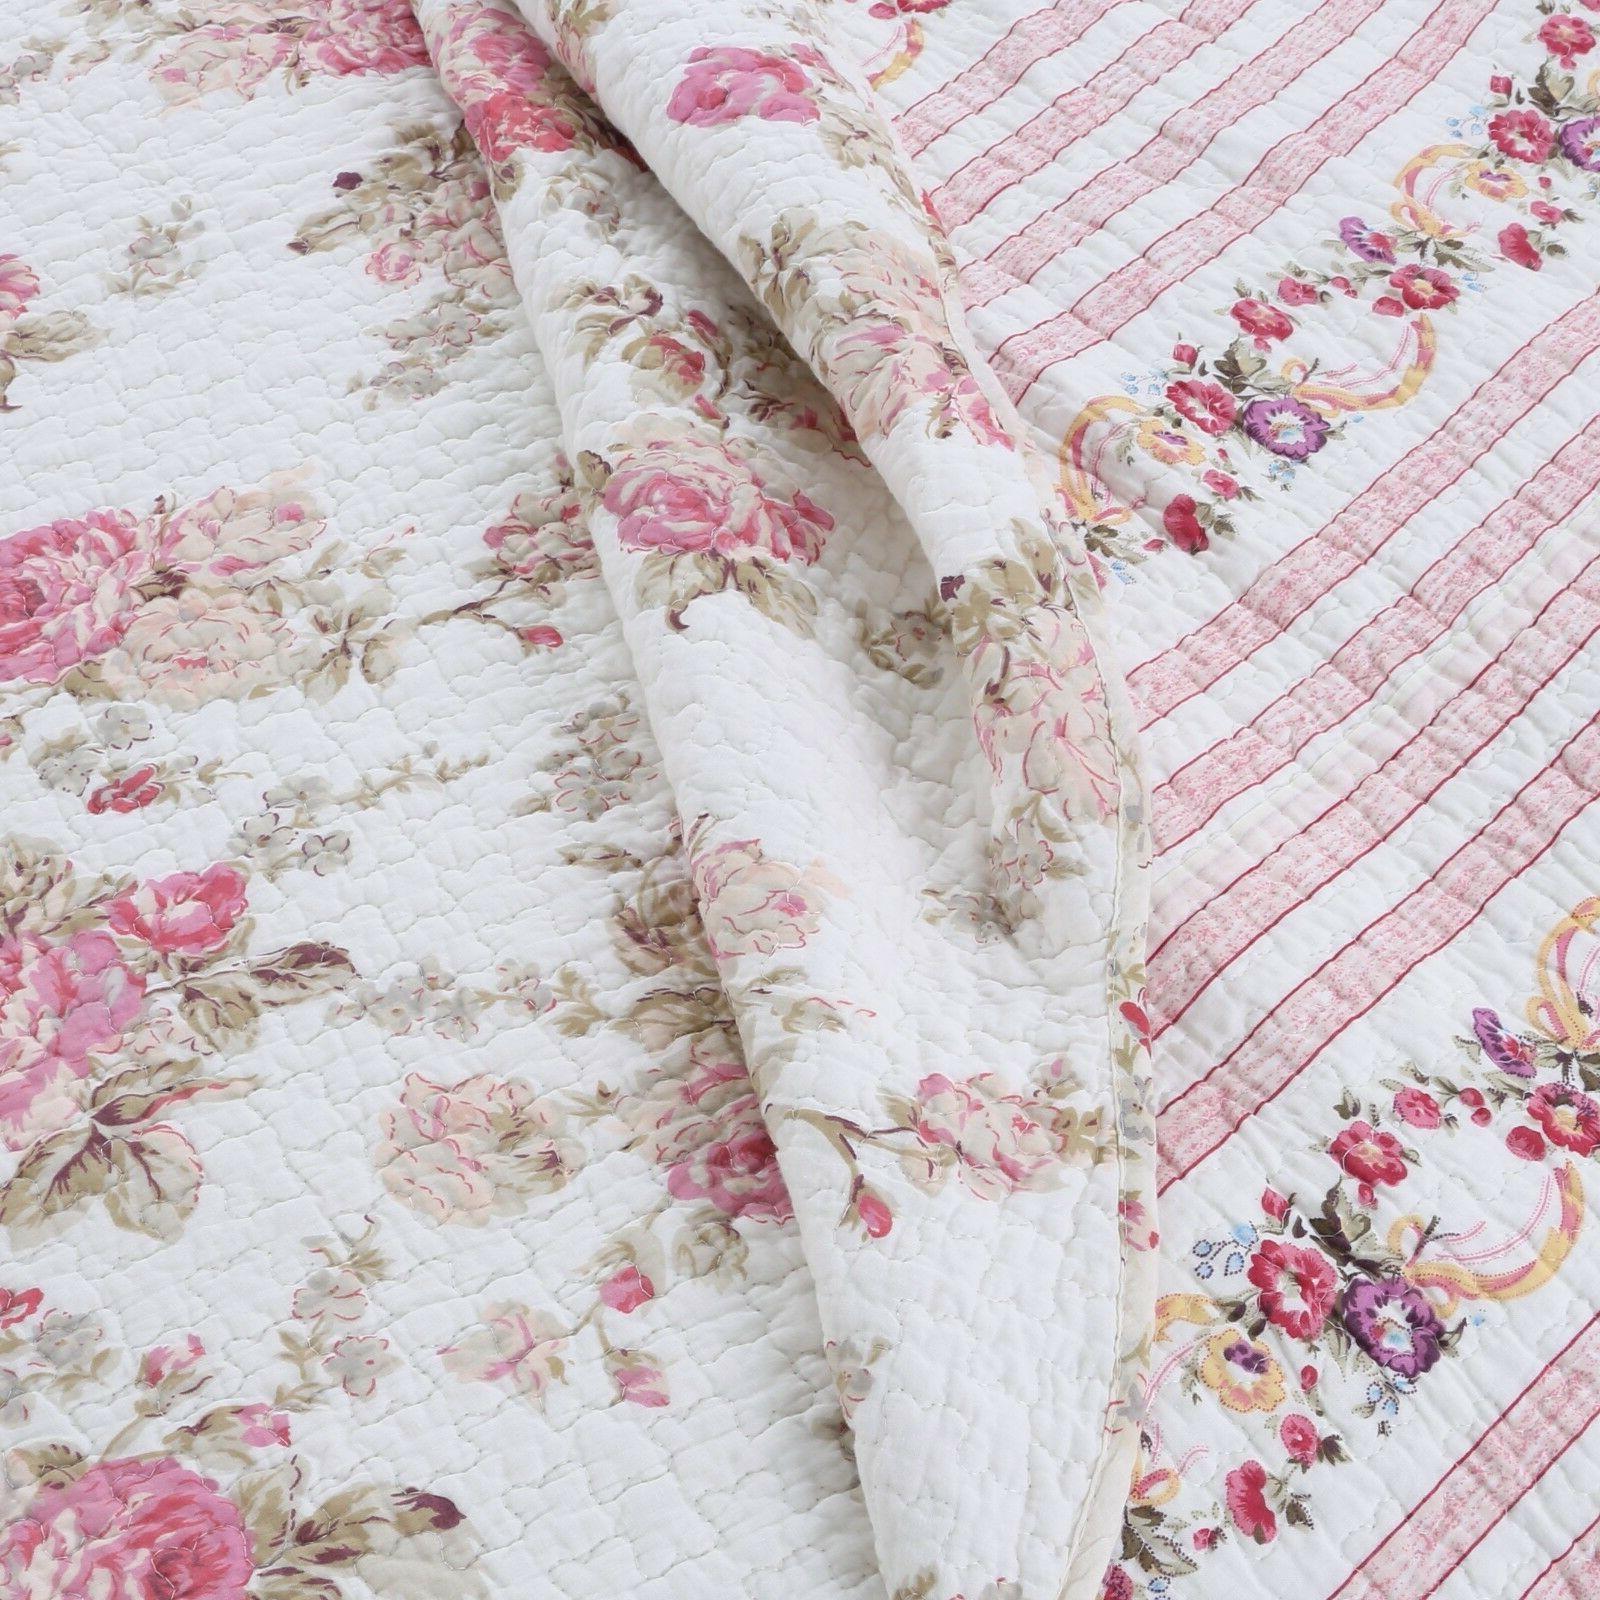 Spring 100%Cotton 3-Piece Quilt Set, Bedspread, Coverlet